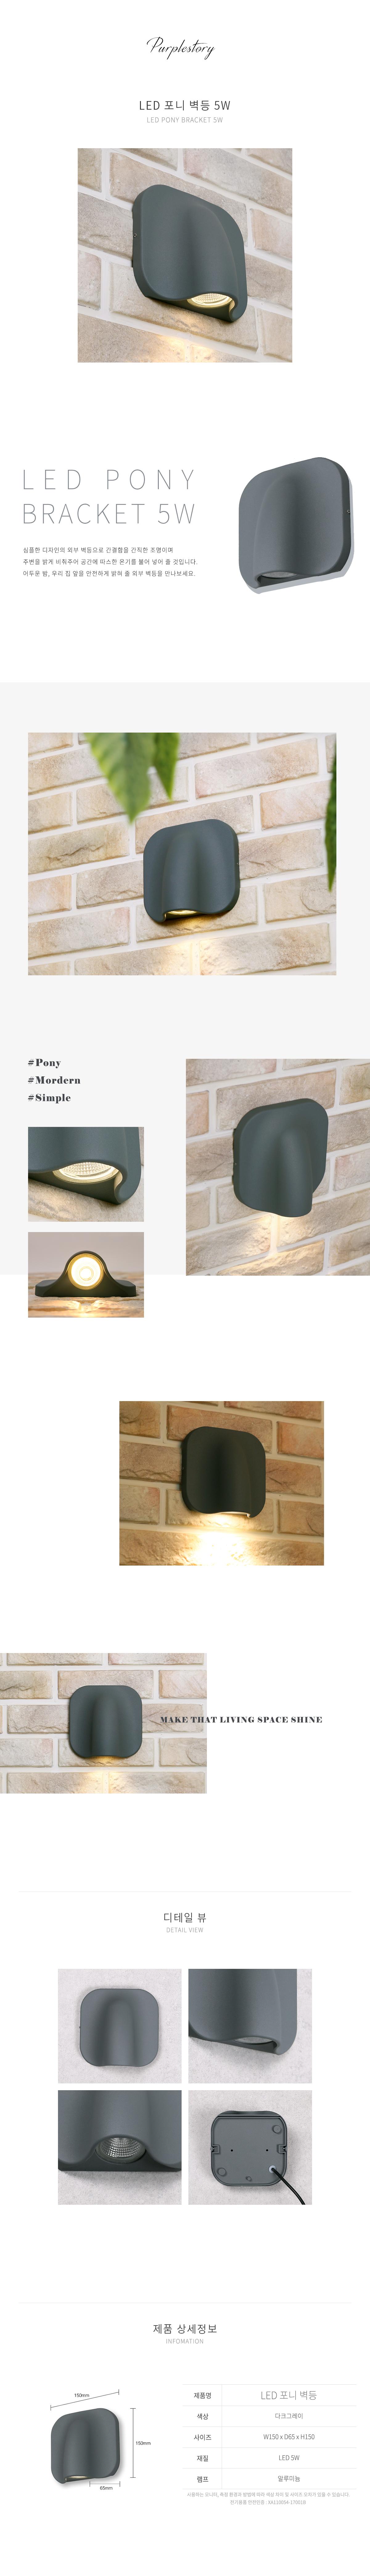 LED 포니 벽등 5W - 퍼플스토리, 62,000원, 리빙조명, 벽조명